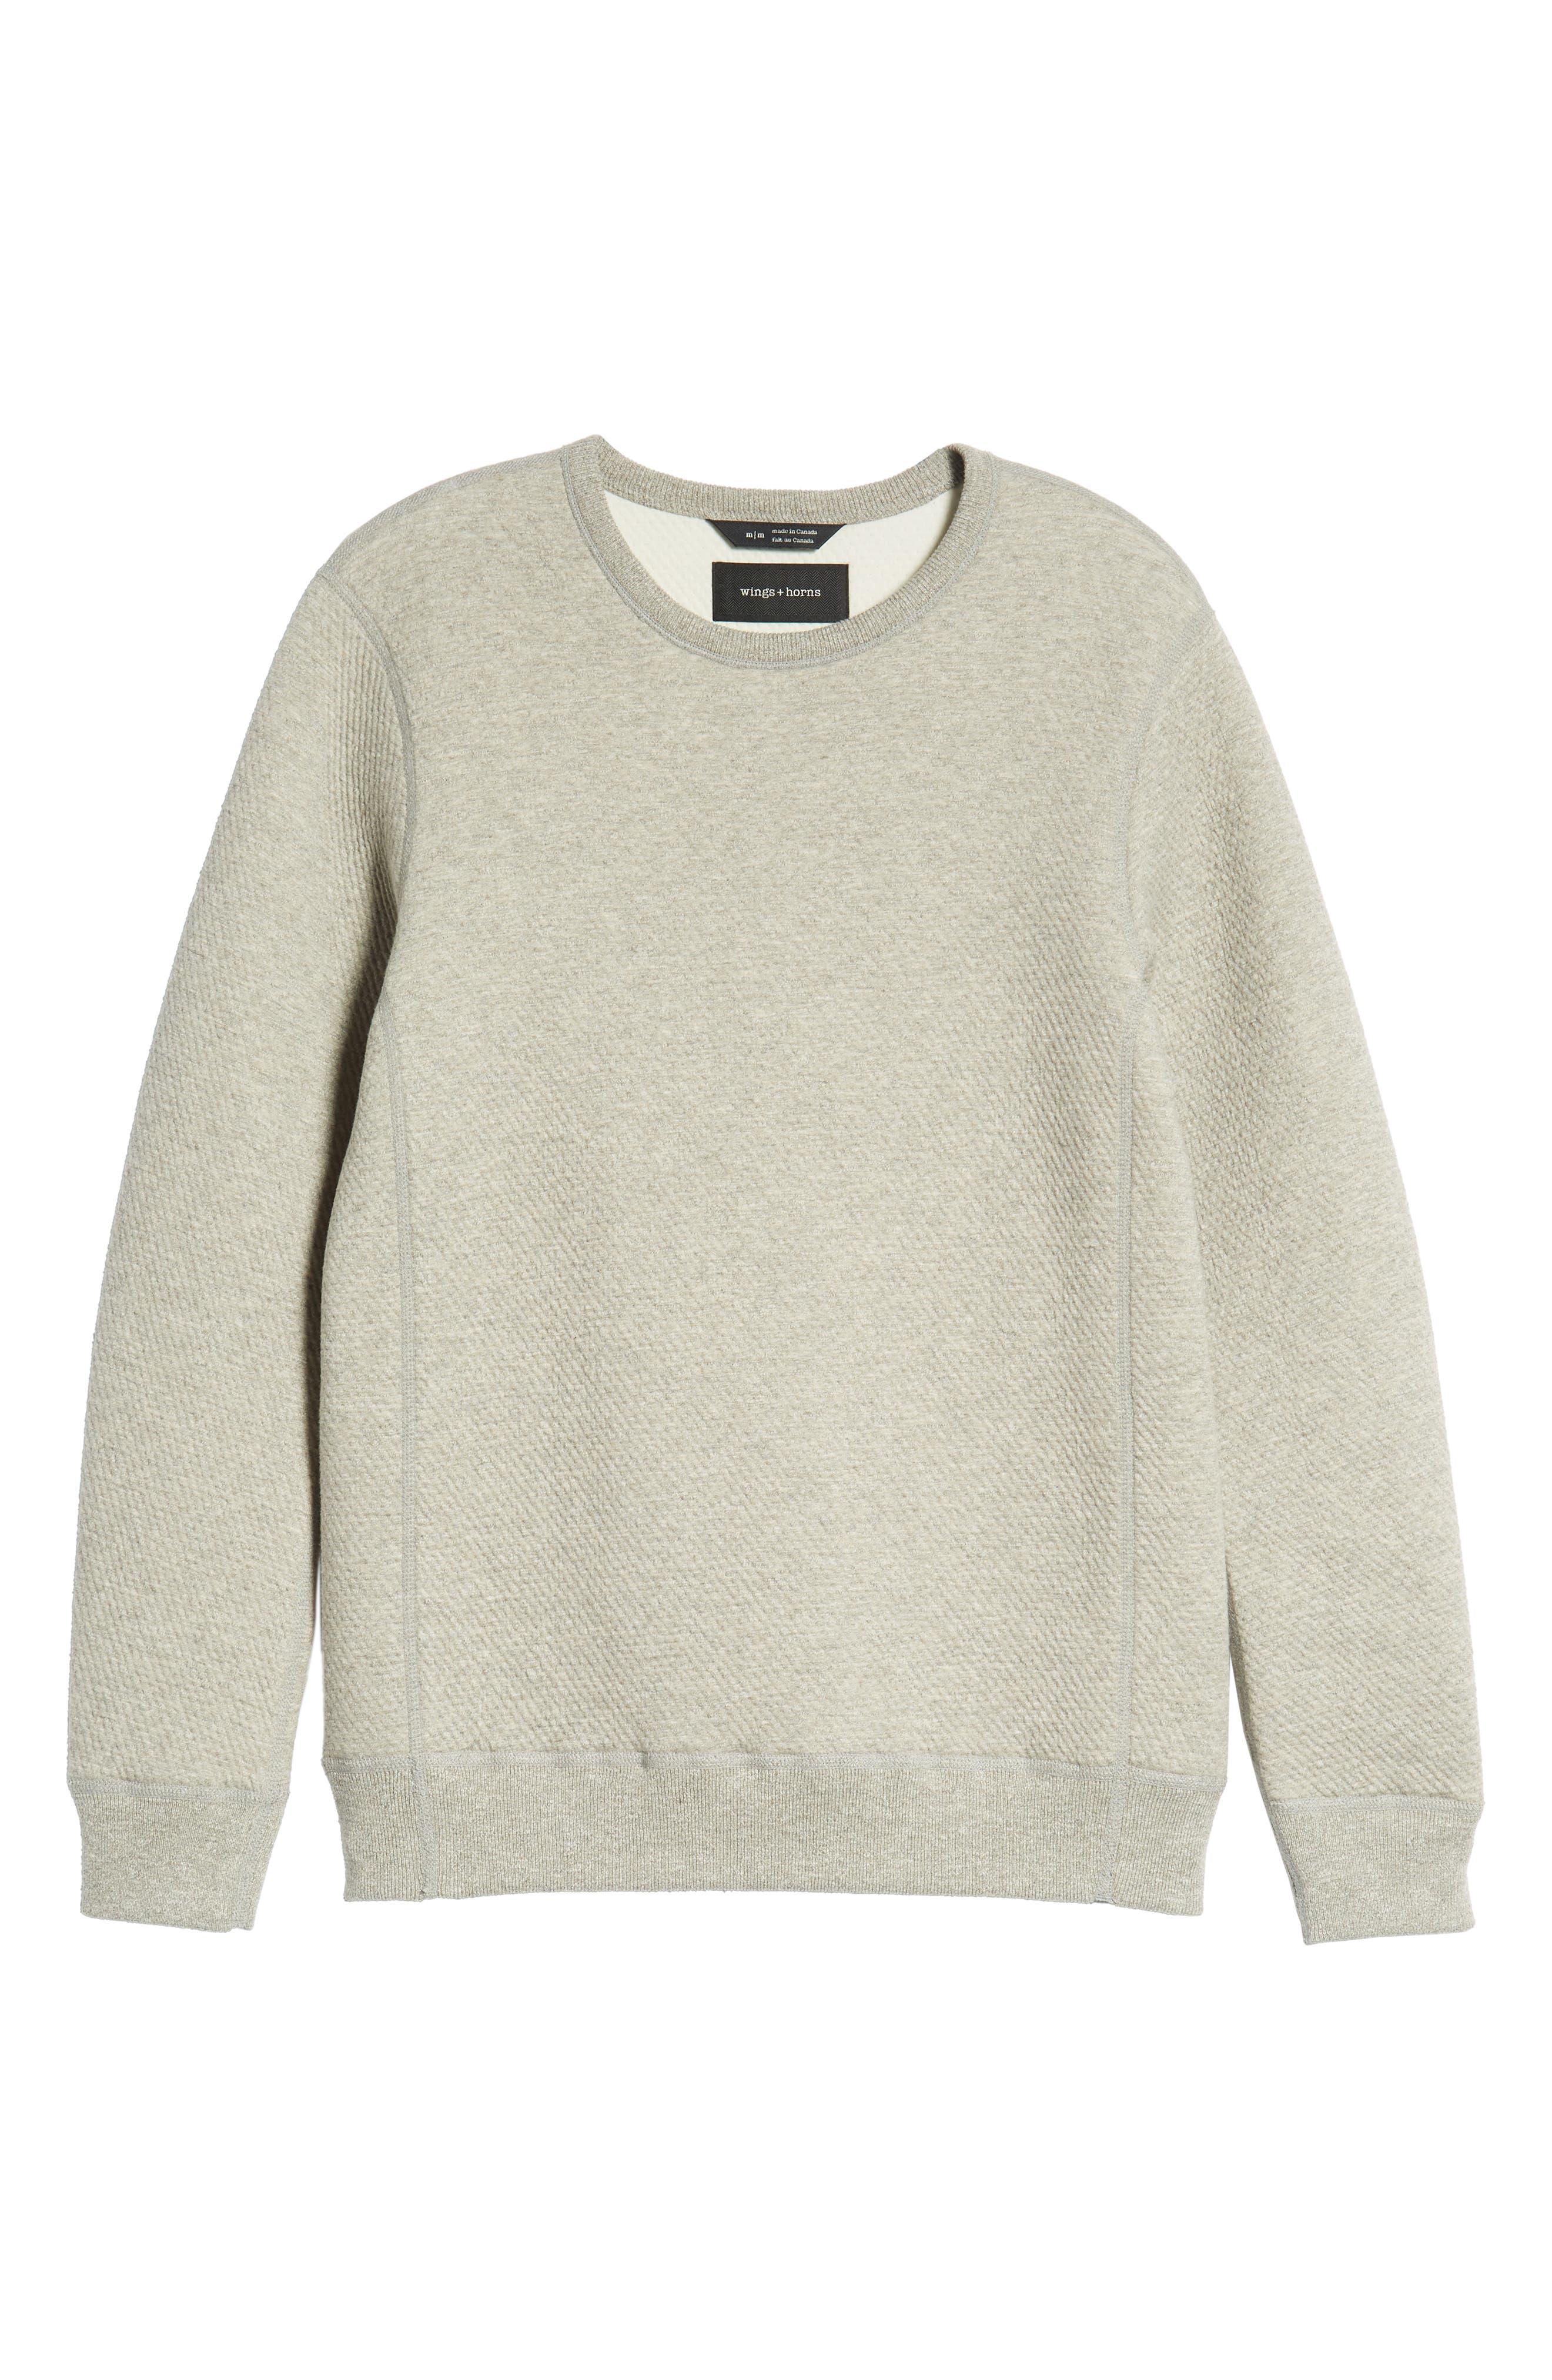 Cabin Fleece Sweatshirt,                             Alternate thumbnail 6, color,                             CONCRETE